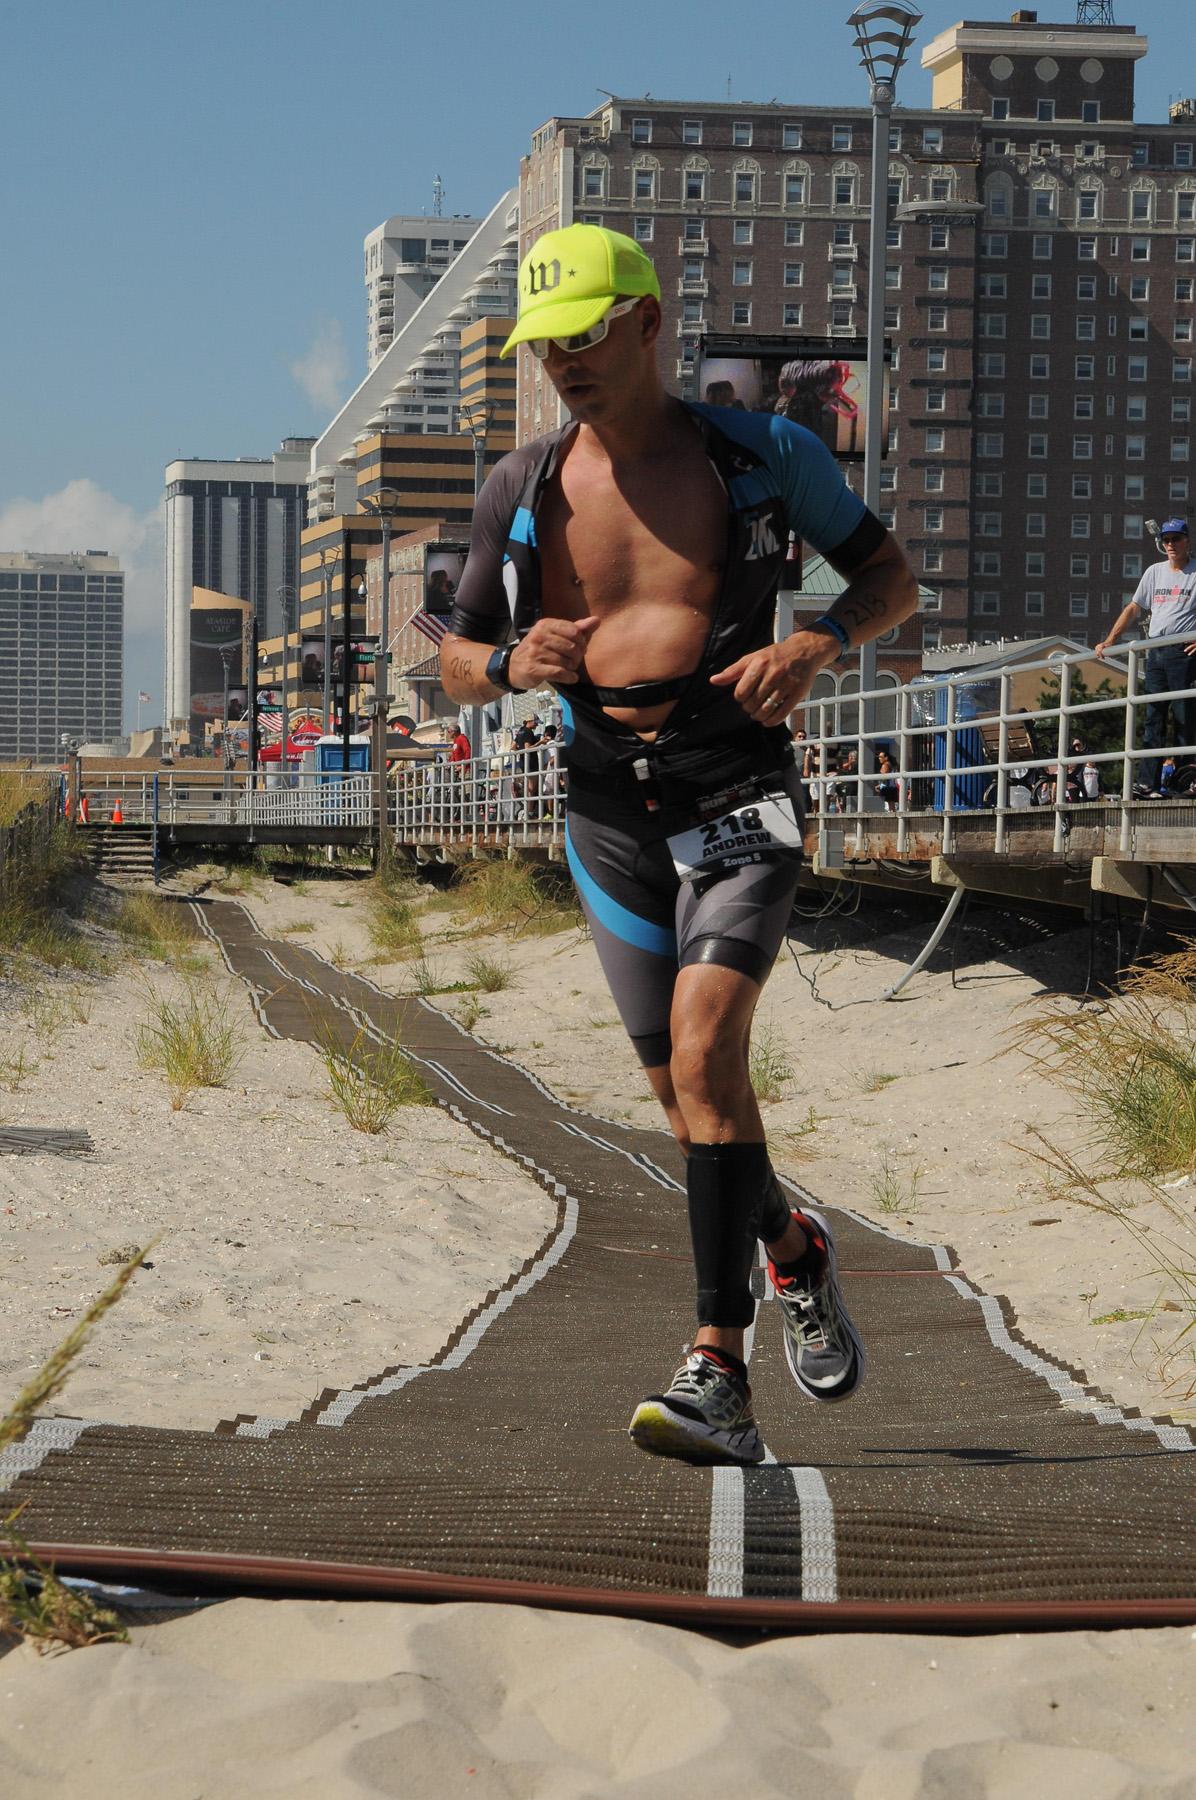 boardwalk city bg beach runway - Ironman 70.3 Atlantic City